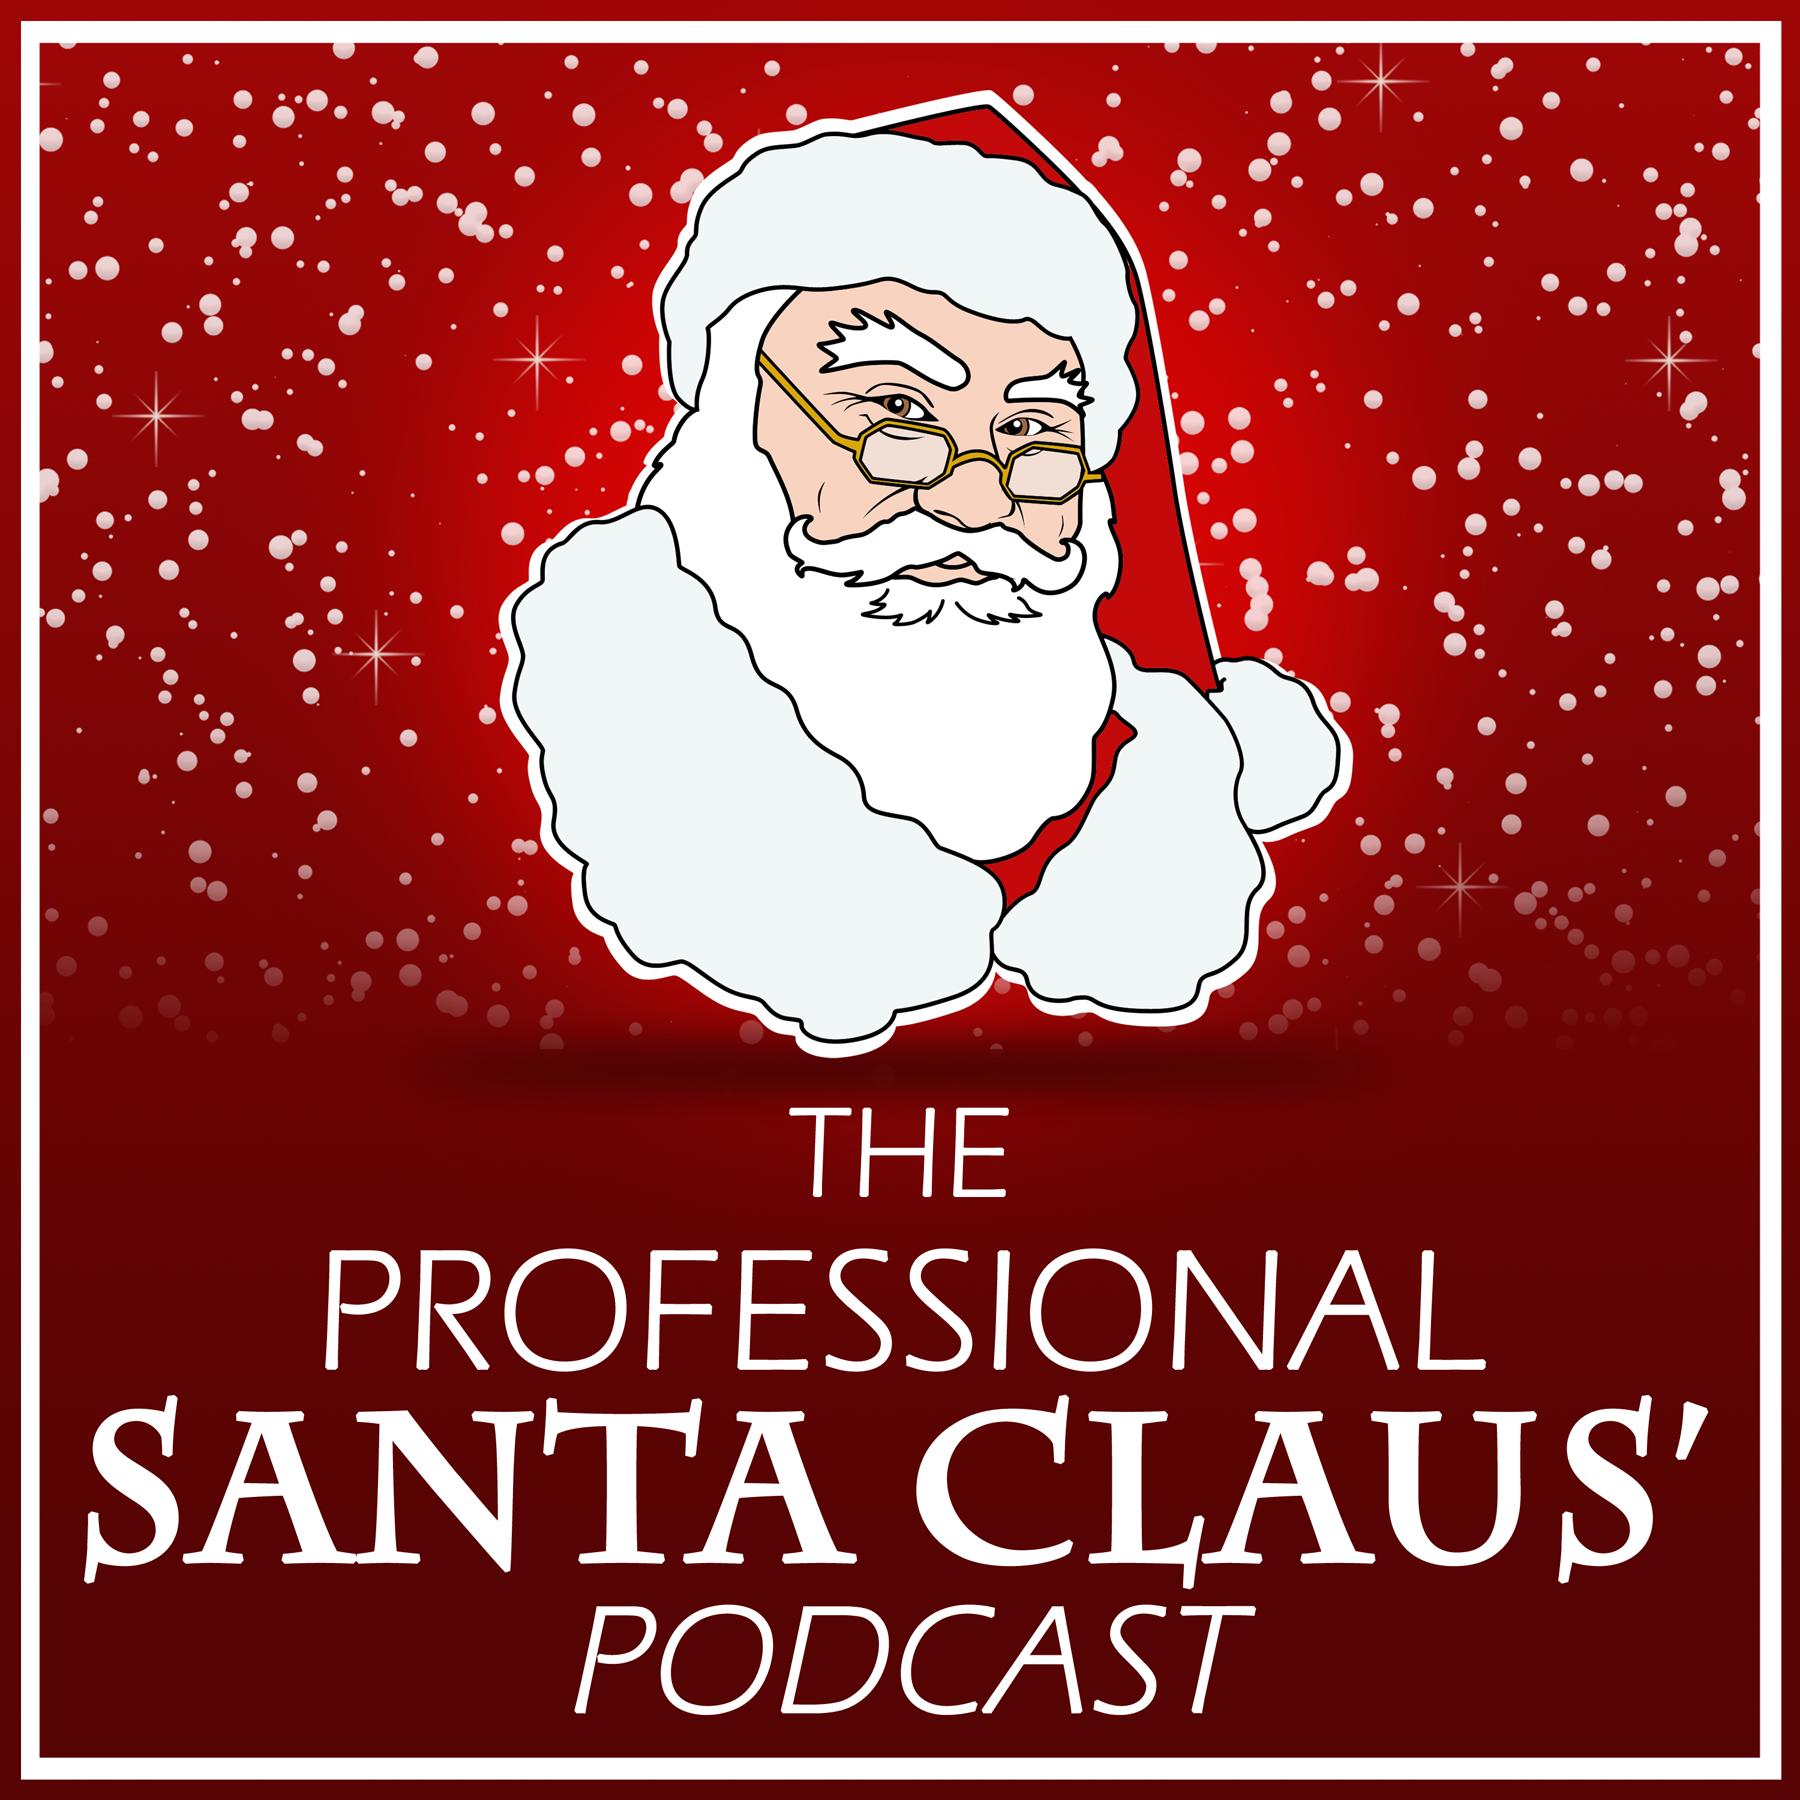 The Professional Santa Claus Podcast Listen Via Stitcher Radio On